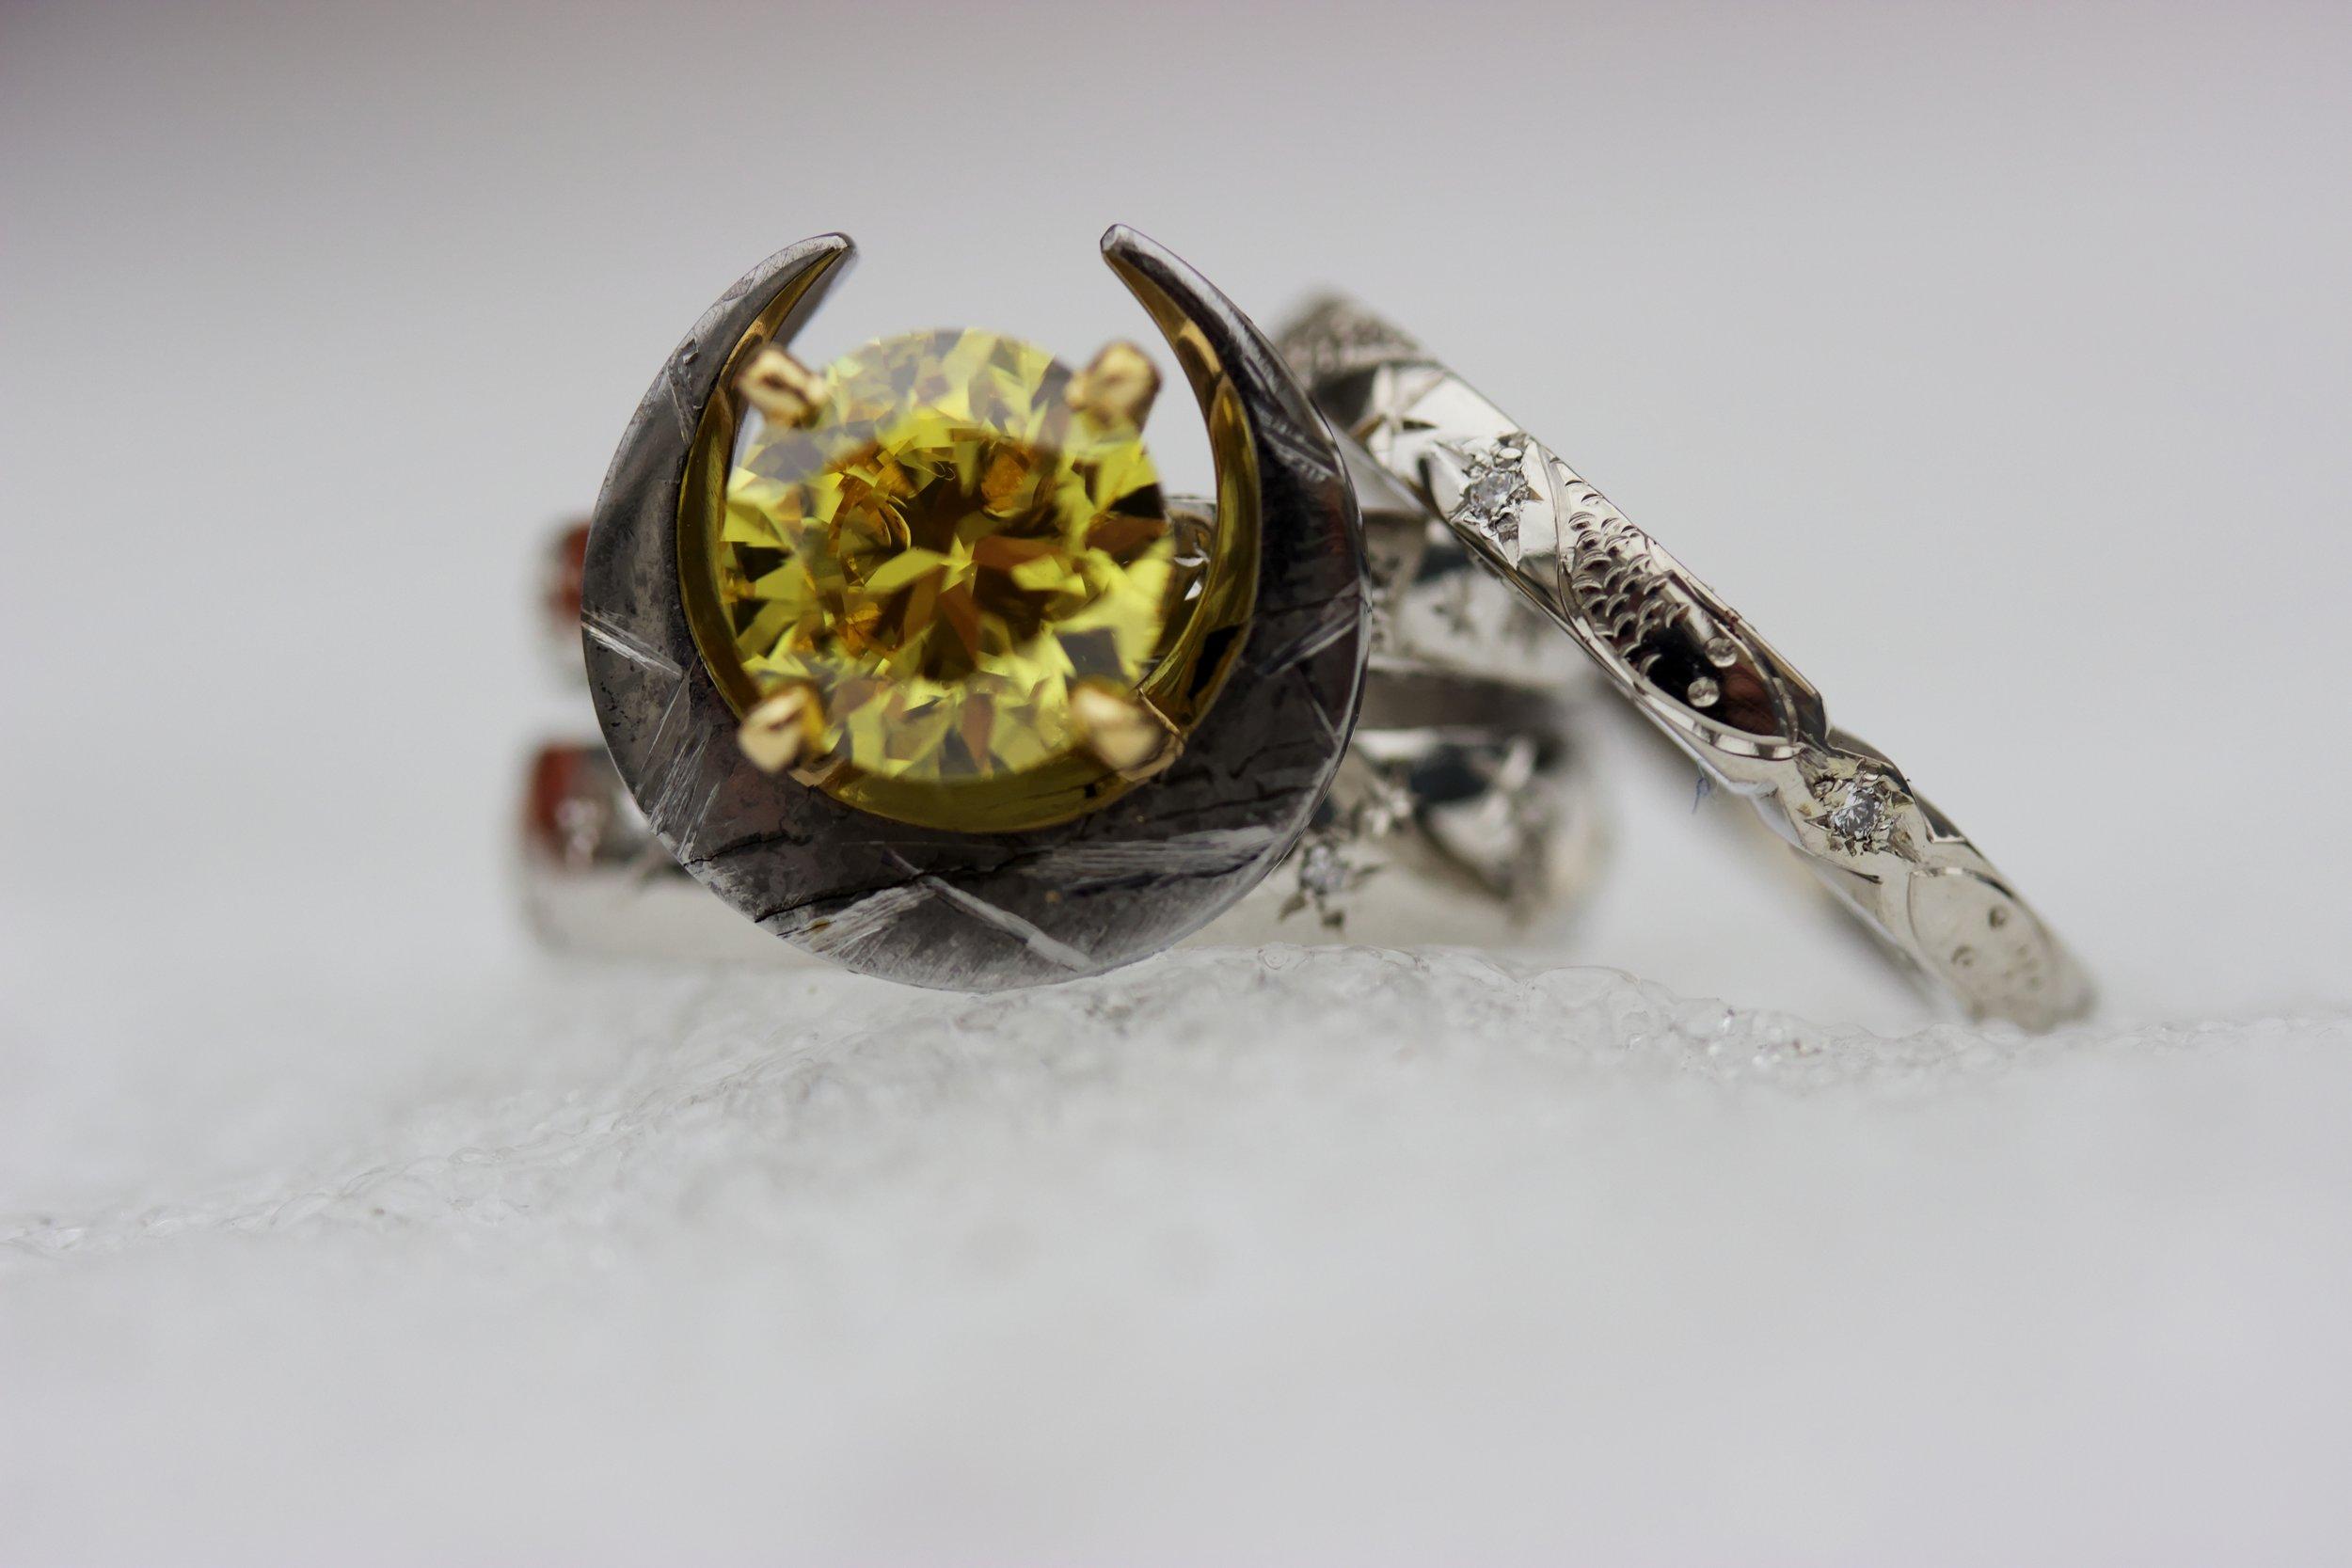 Custom_Yellow_Diamond_Atlantides_Meteorite_Eclipse_Serpens_2015-11-05 00.50.22_tonemapped.jpg